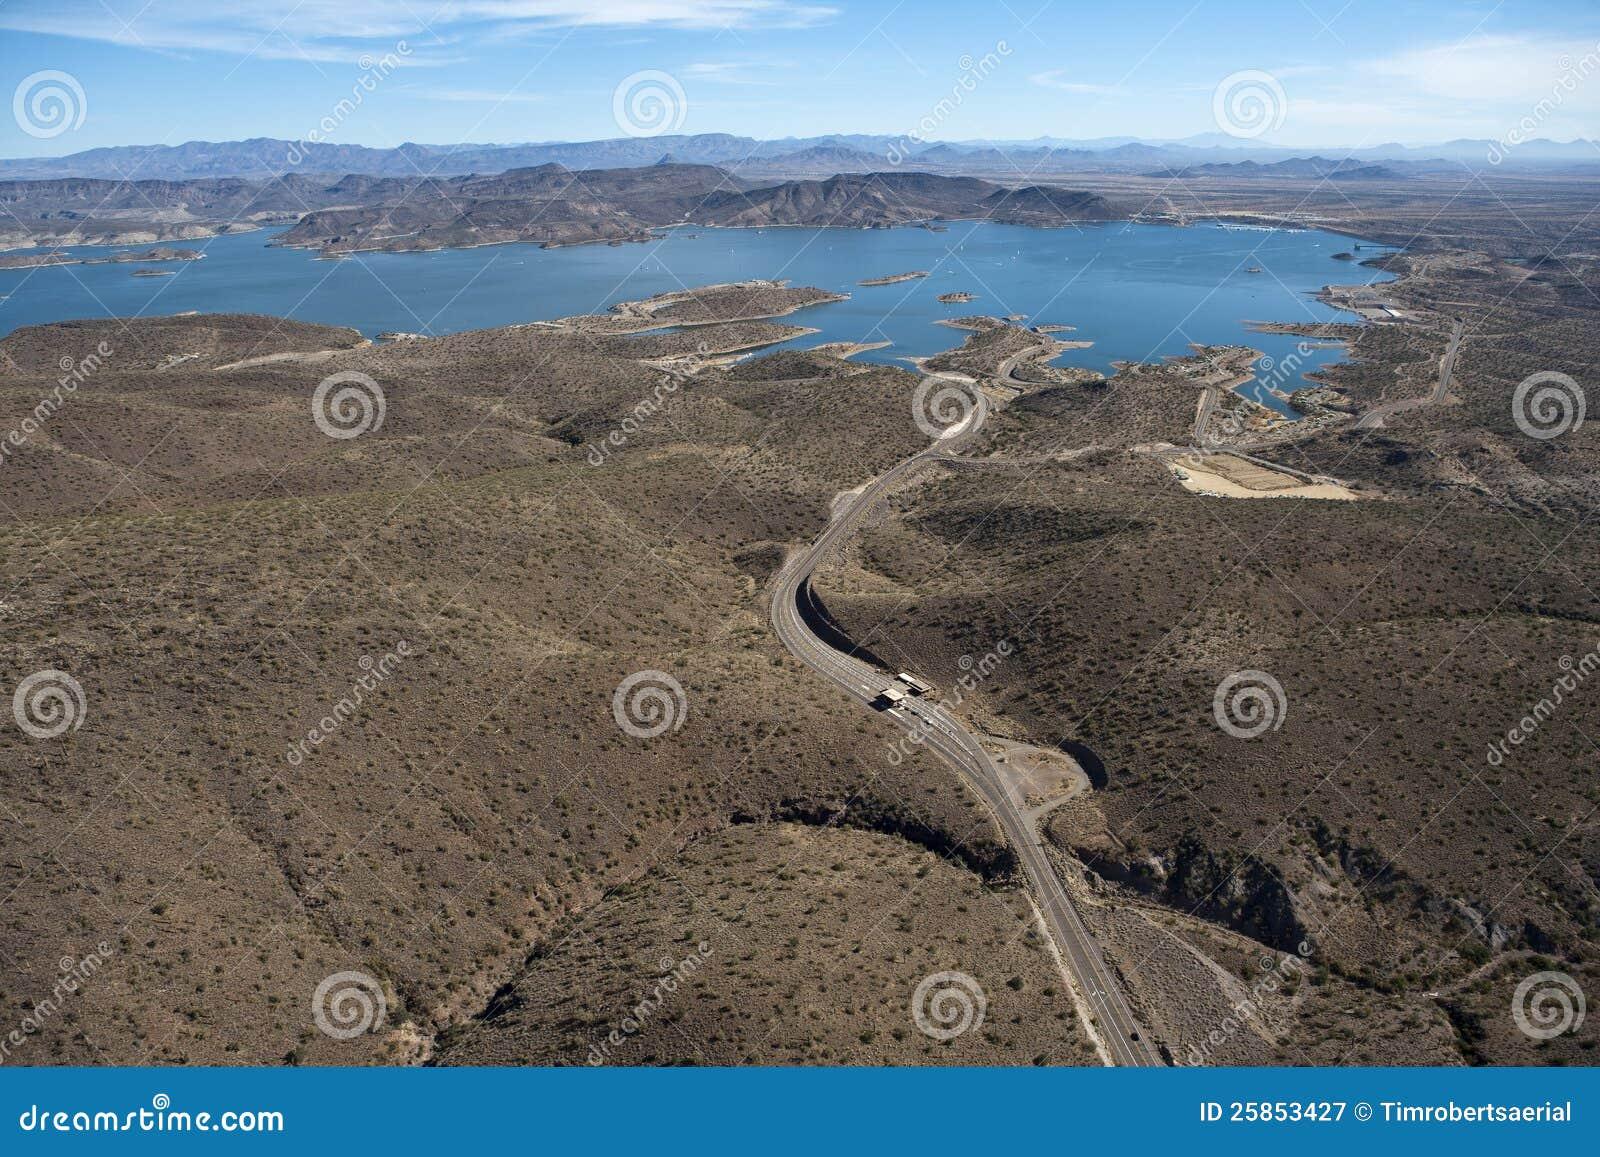 Lake pleasant arizona royalty free stock photography for Fishing license az price